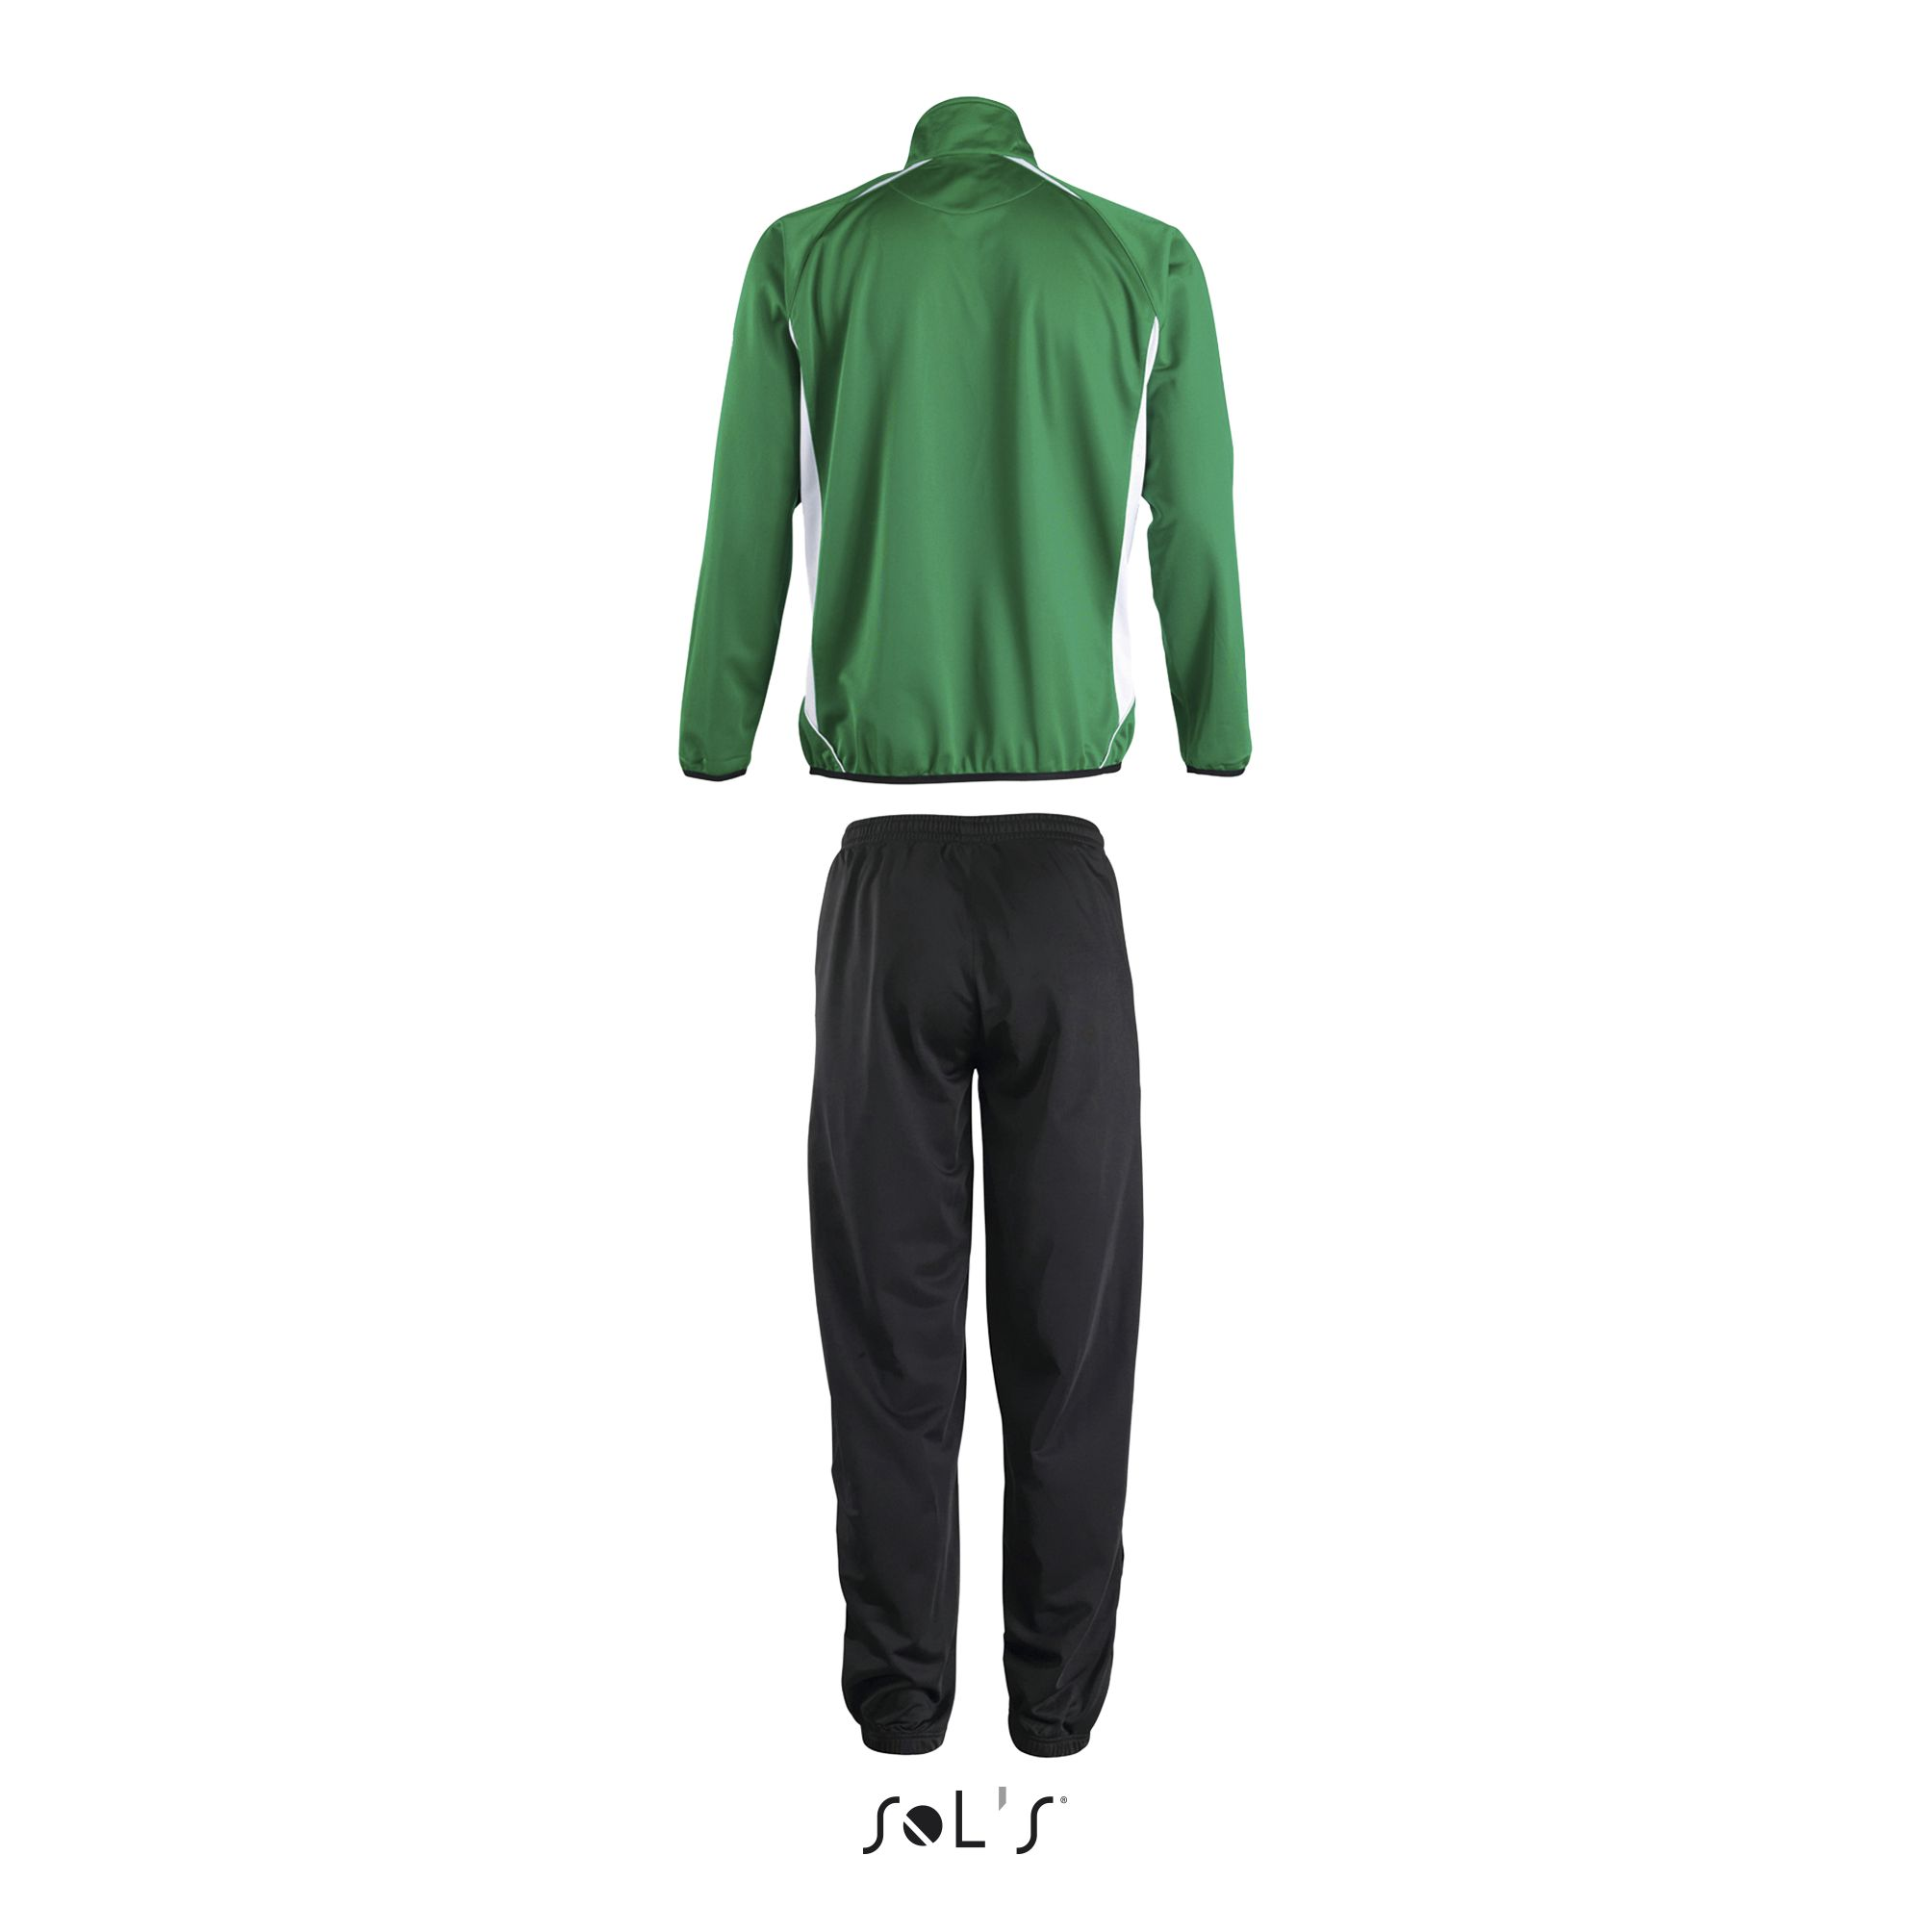 929 - Vert Vif-Blanc / Noir